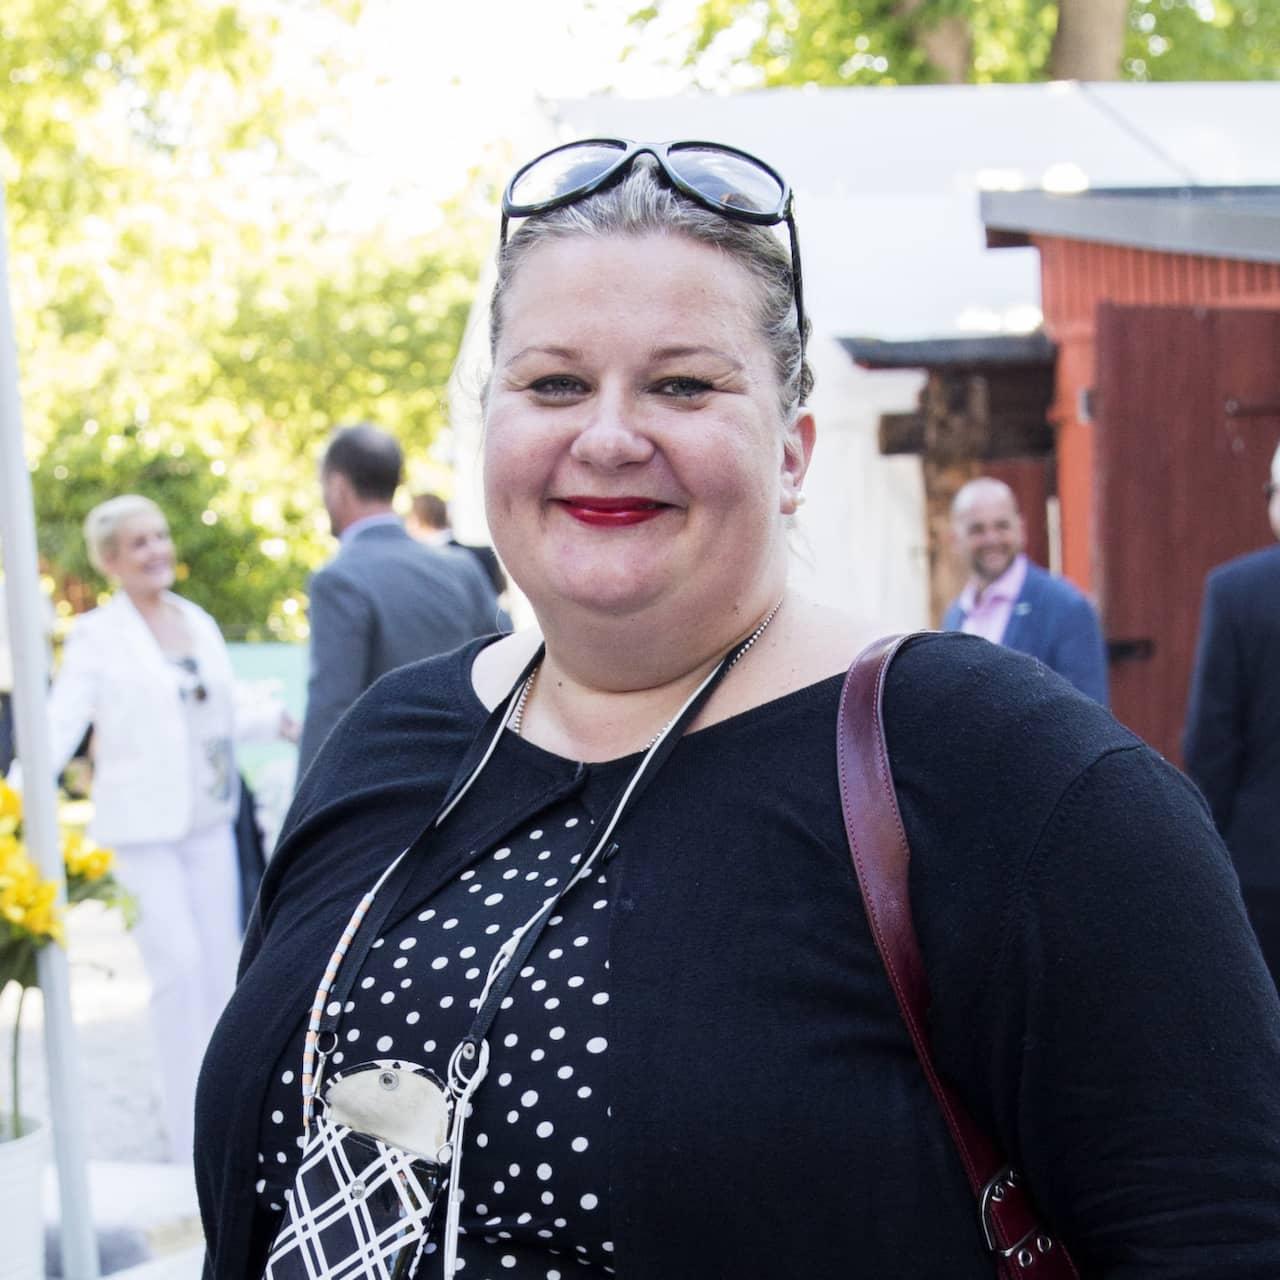 43. Anna Gullberg